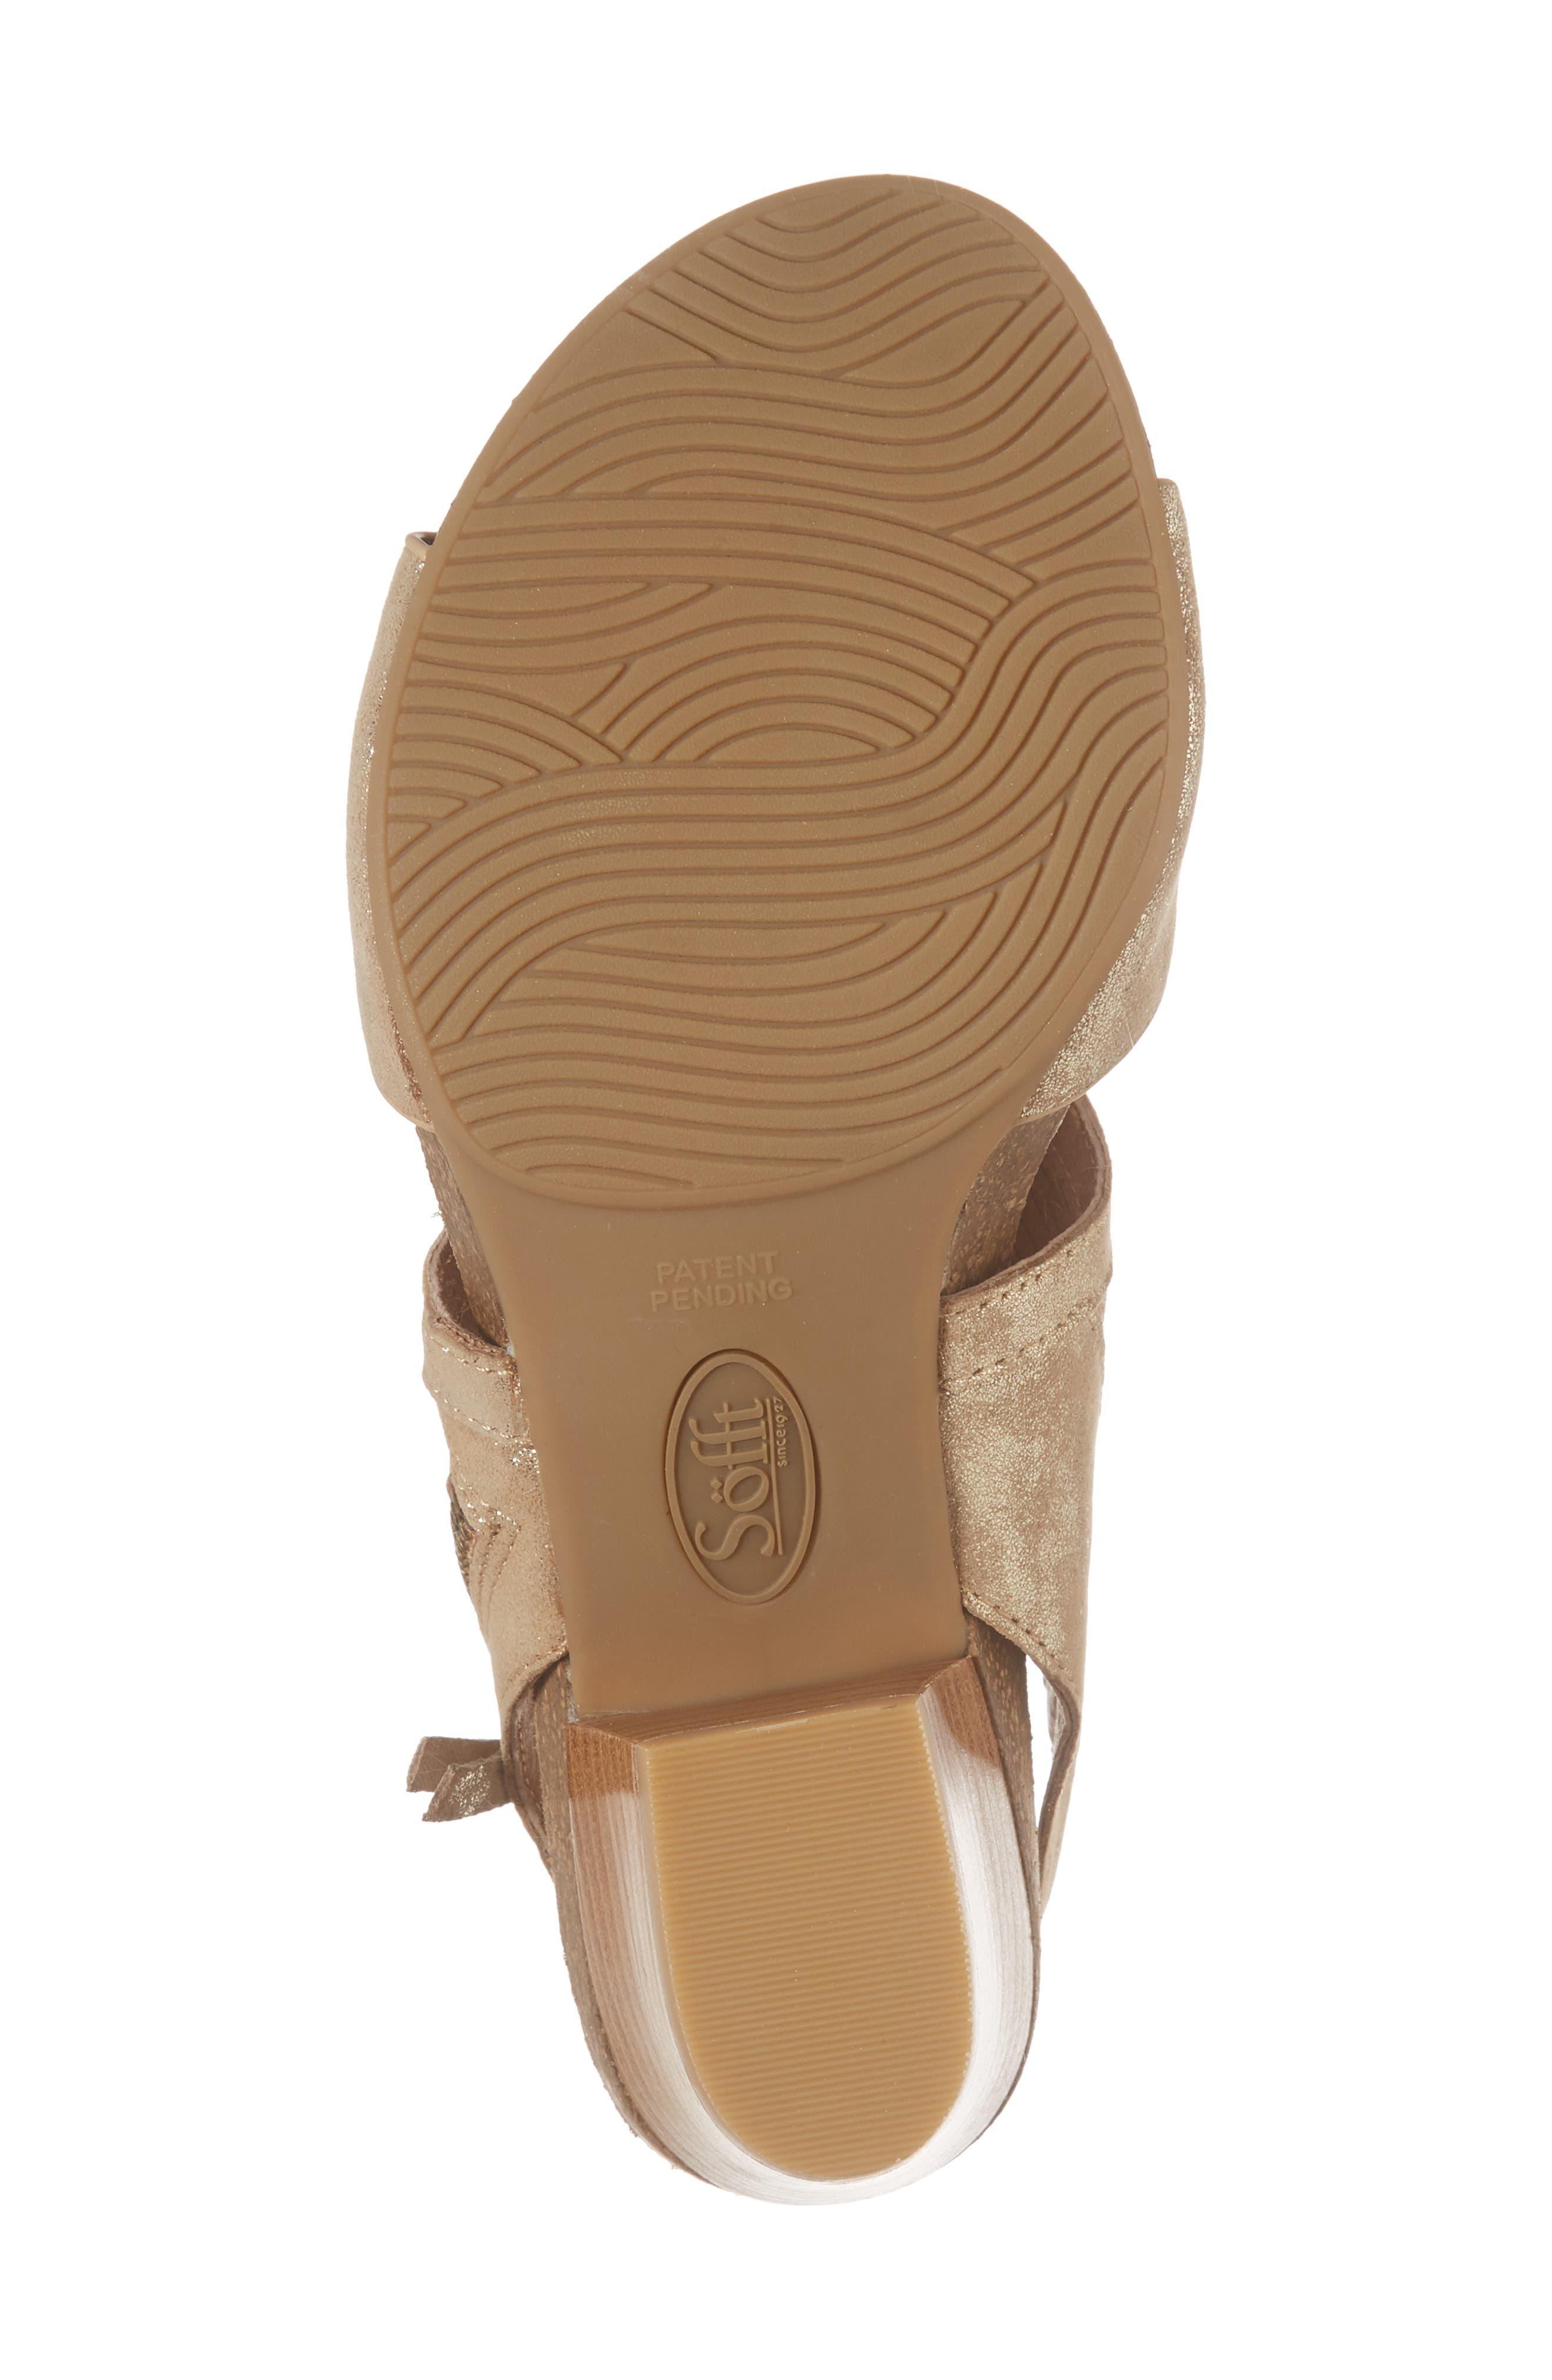 Milan Block Heel Sandal,                             Alternate thumbnail 6, color,                             PLATINO DISTRESSED FOIL SUEDE